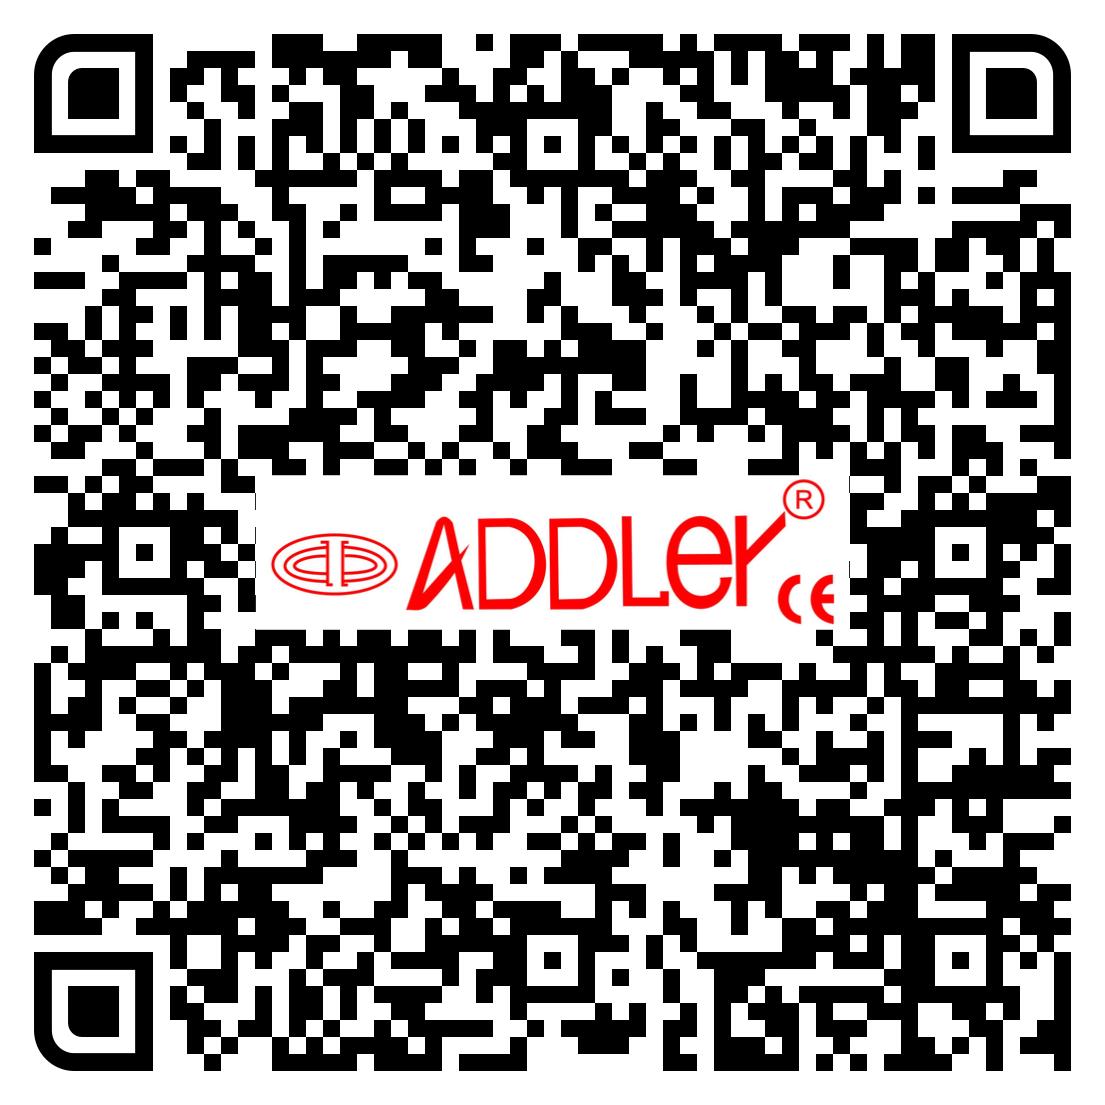 Brand New ADDLER Laparoscopic & Endoscopic Grasper Set of 4Brand New Addler Laparoscopic & Endoscopic Grasper Set Of 4